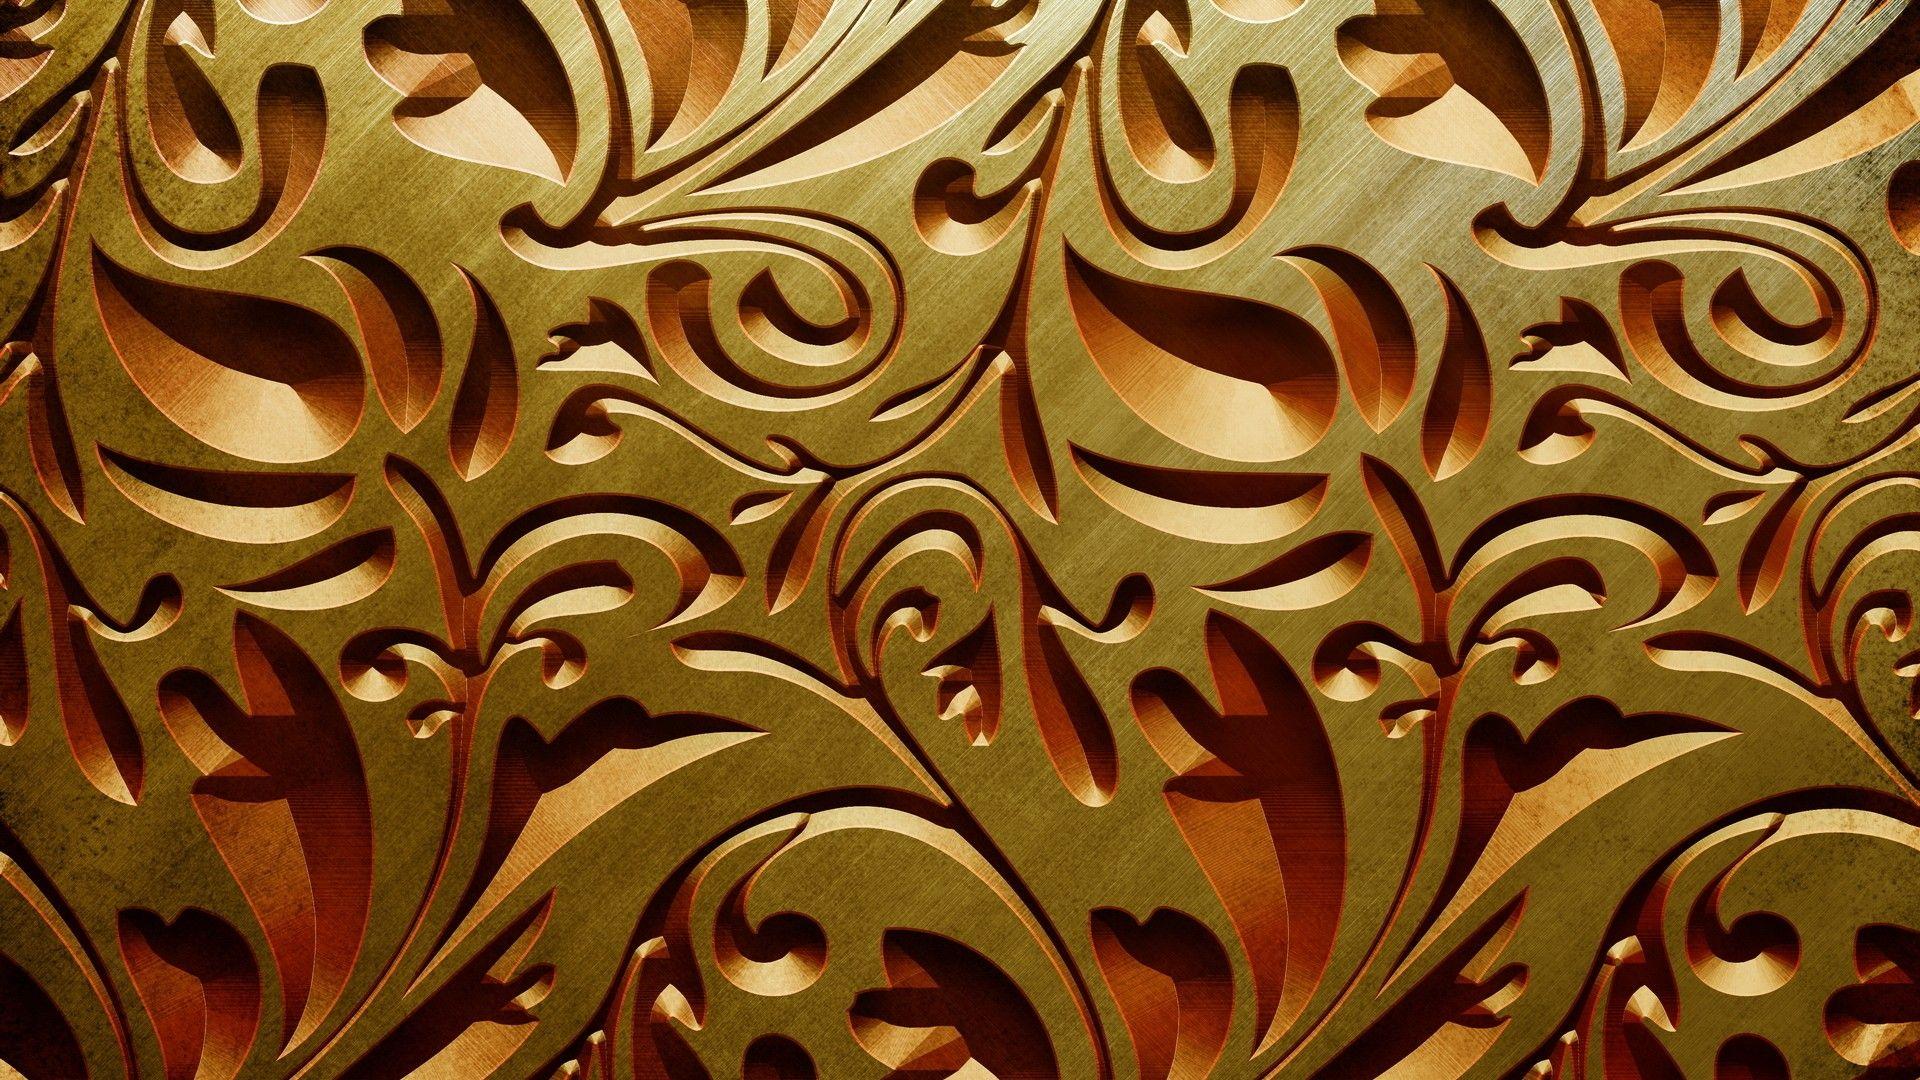 Download Textures Gold Floral Wallpaper 1920x1080